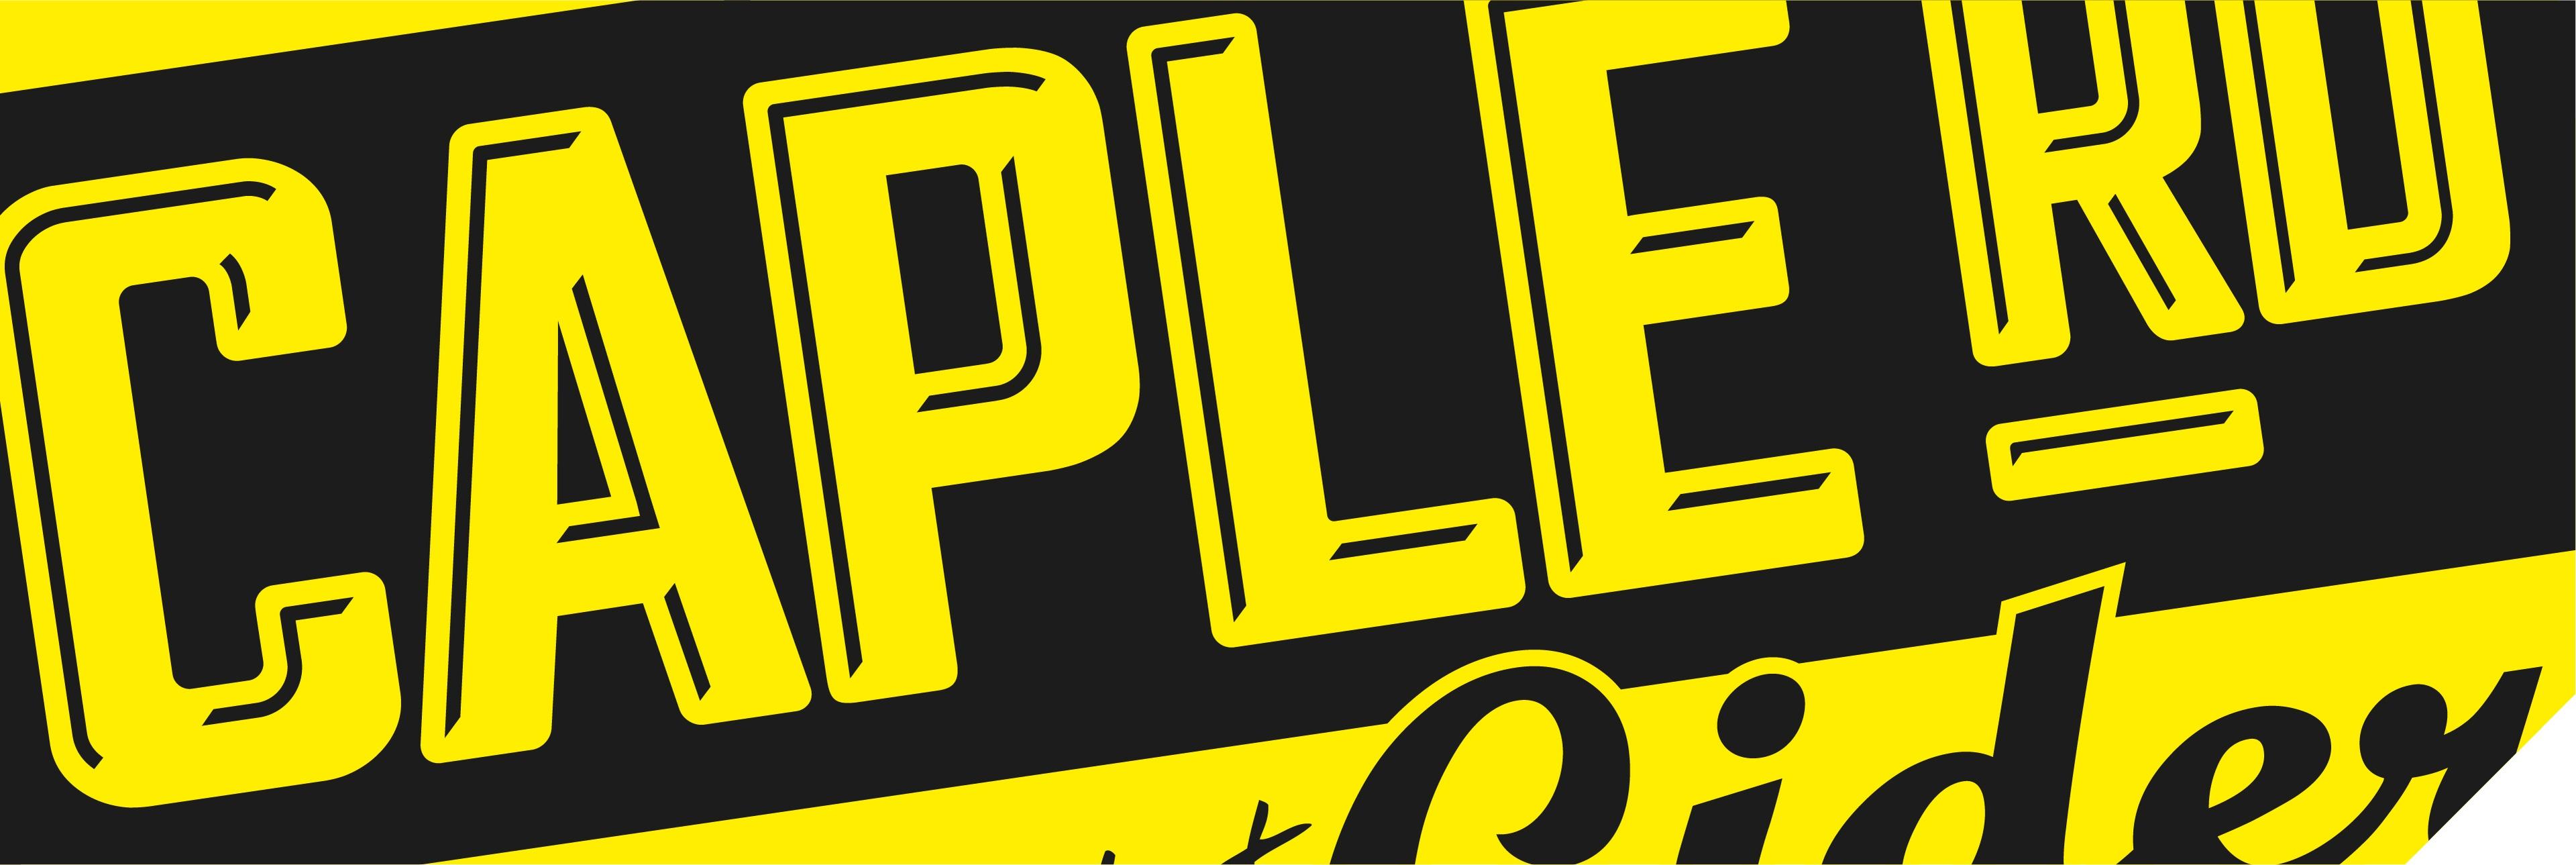 Brand on Shelf - work - weston cider - caple rd